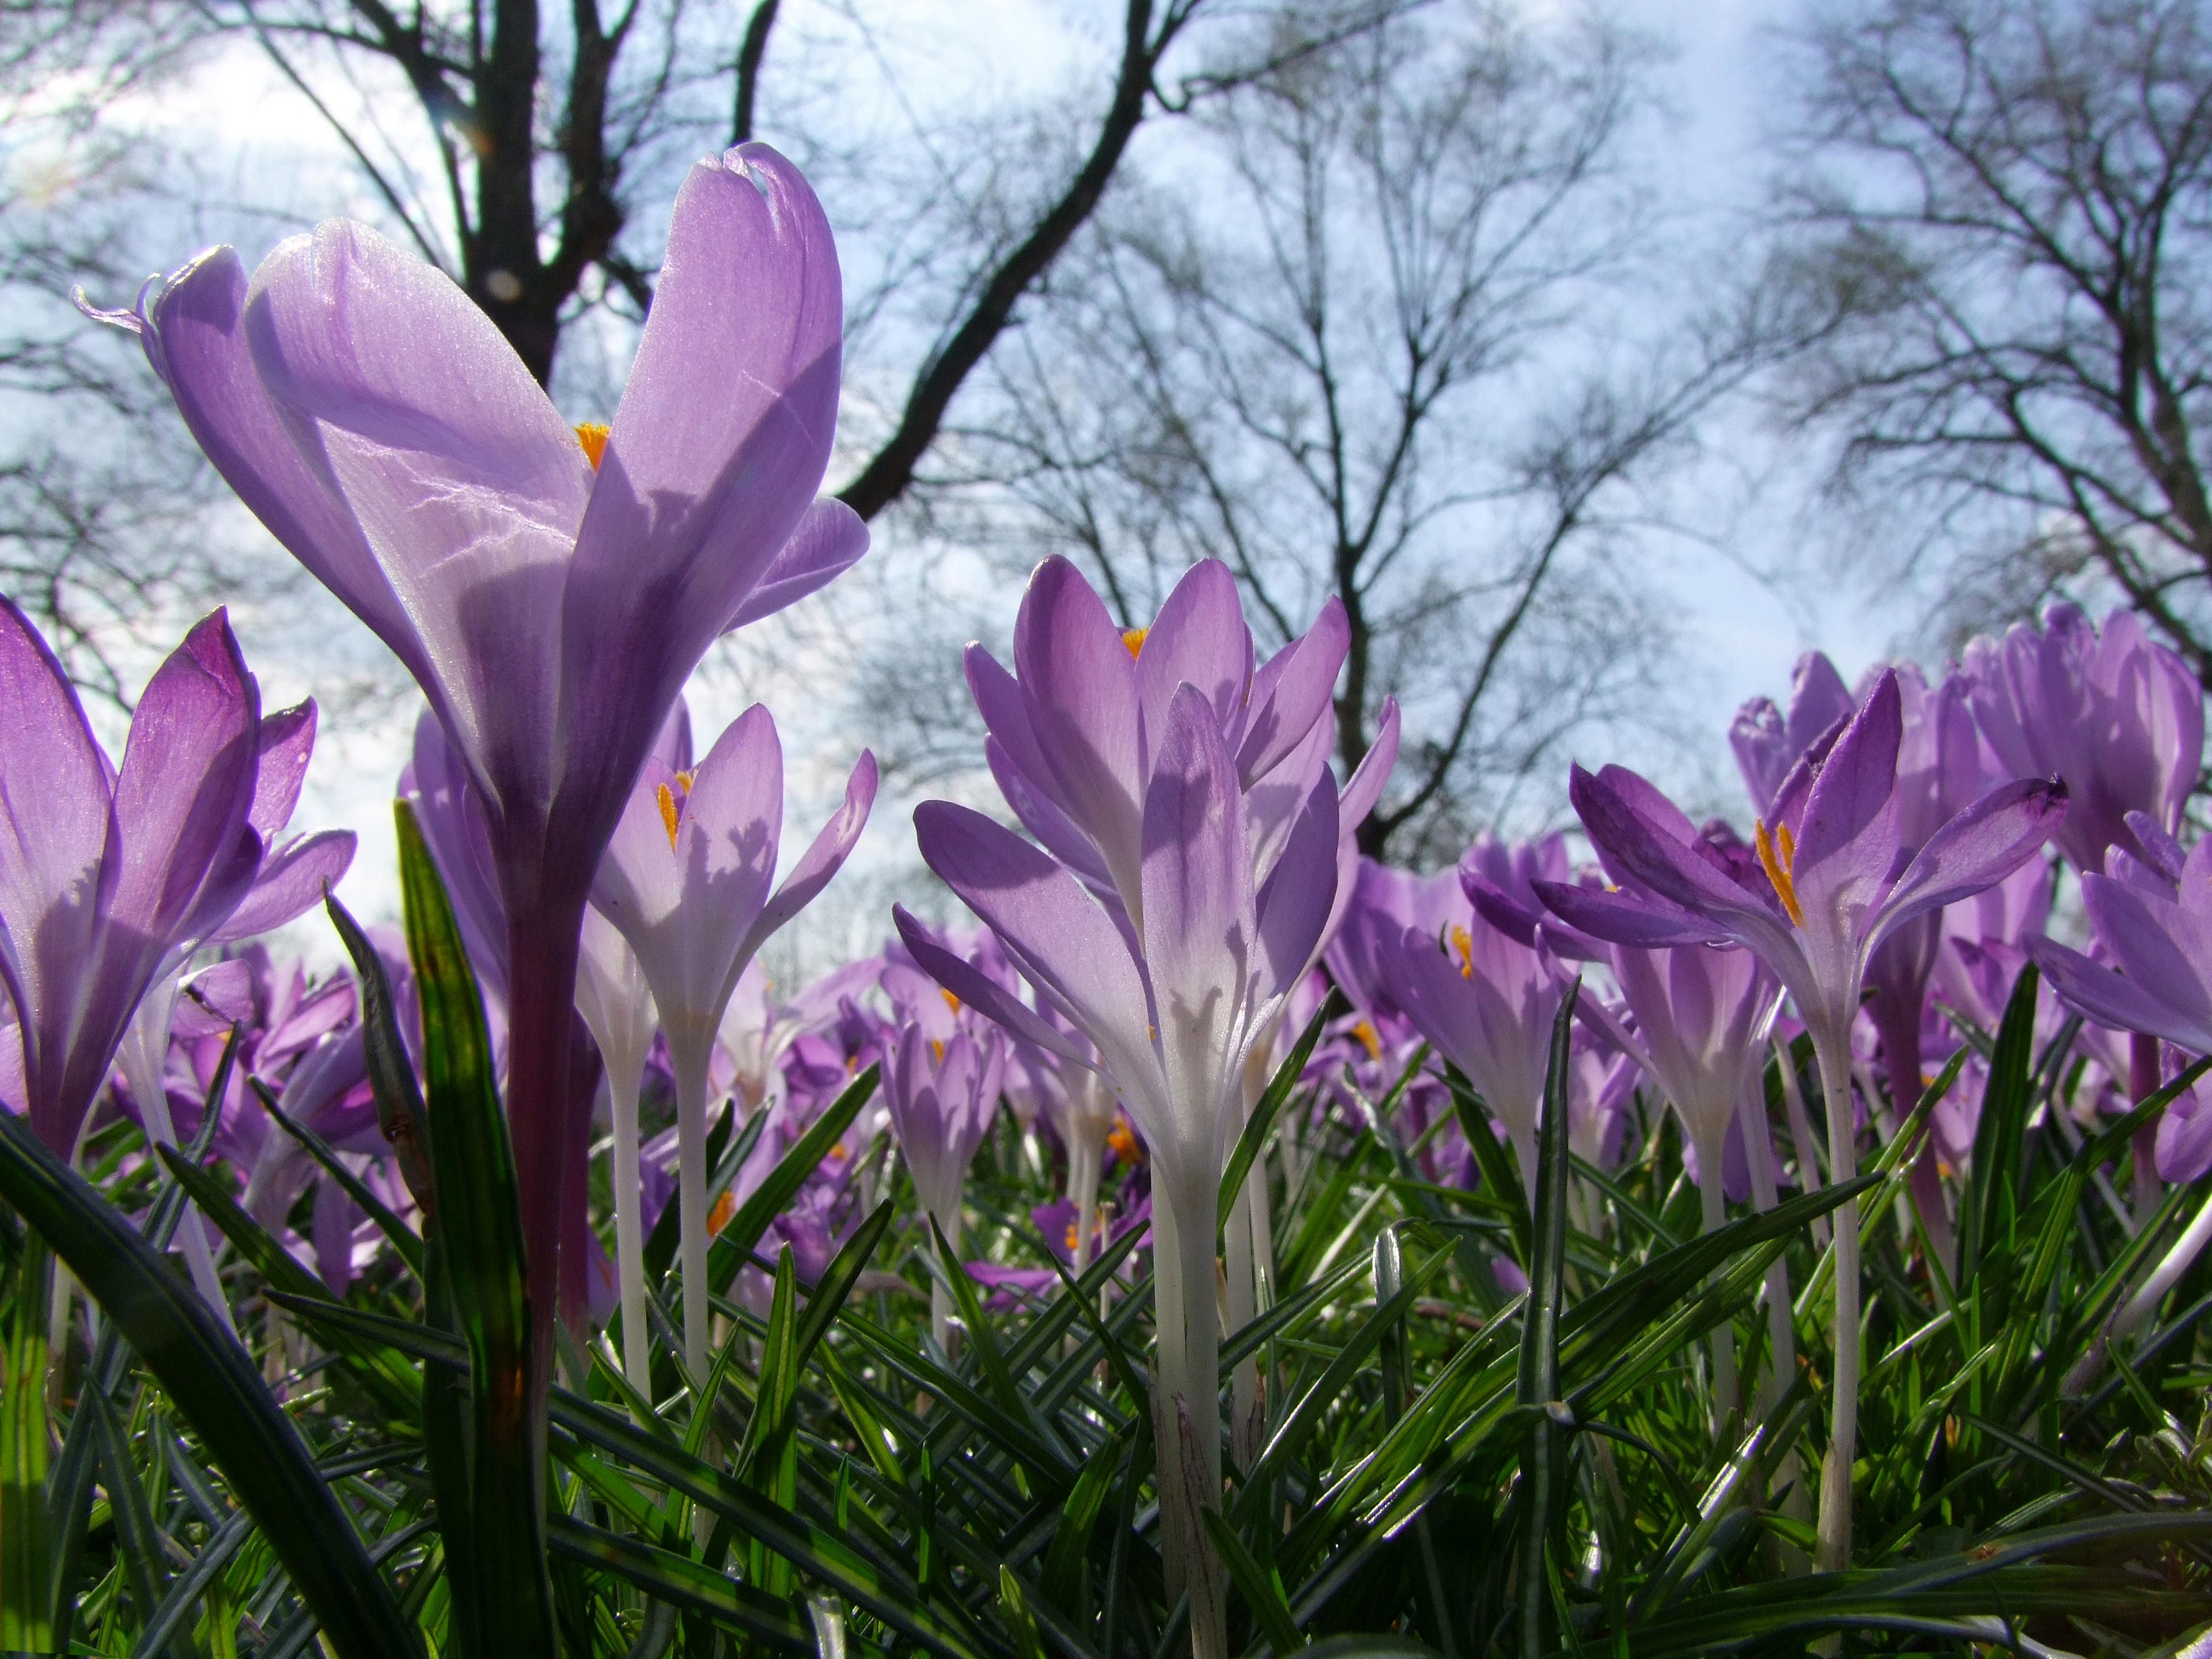 Gambar Mekar Menanam Daun Bunga Musim Semi Taman Botani